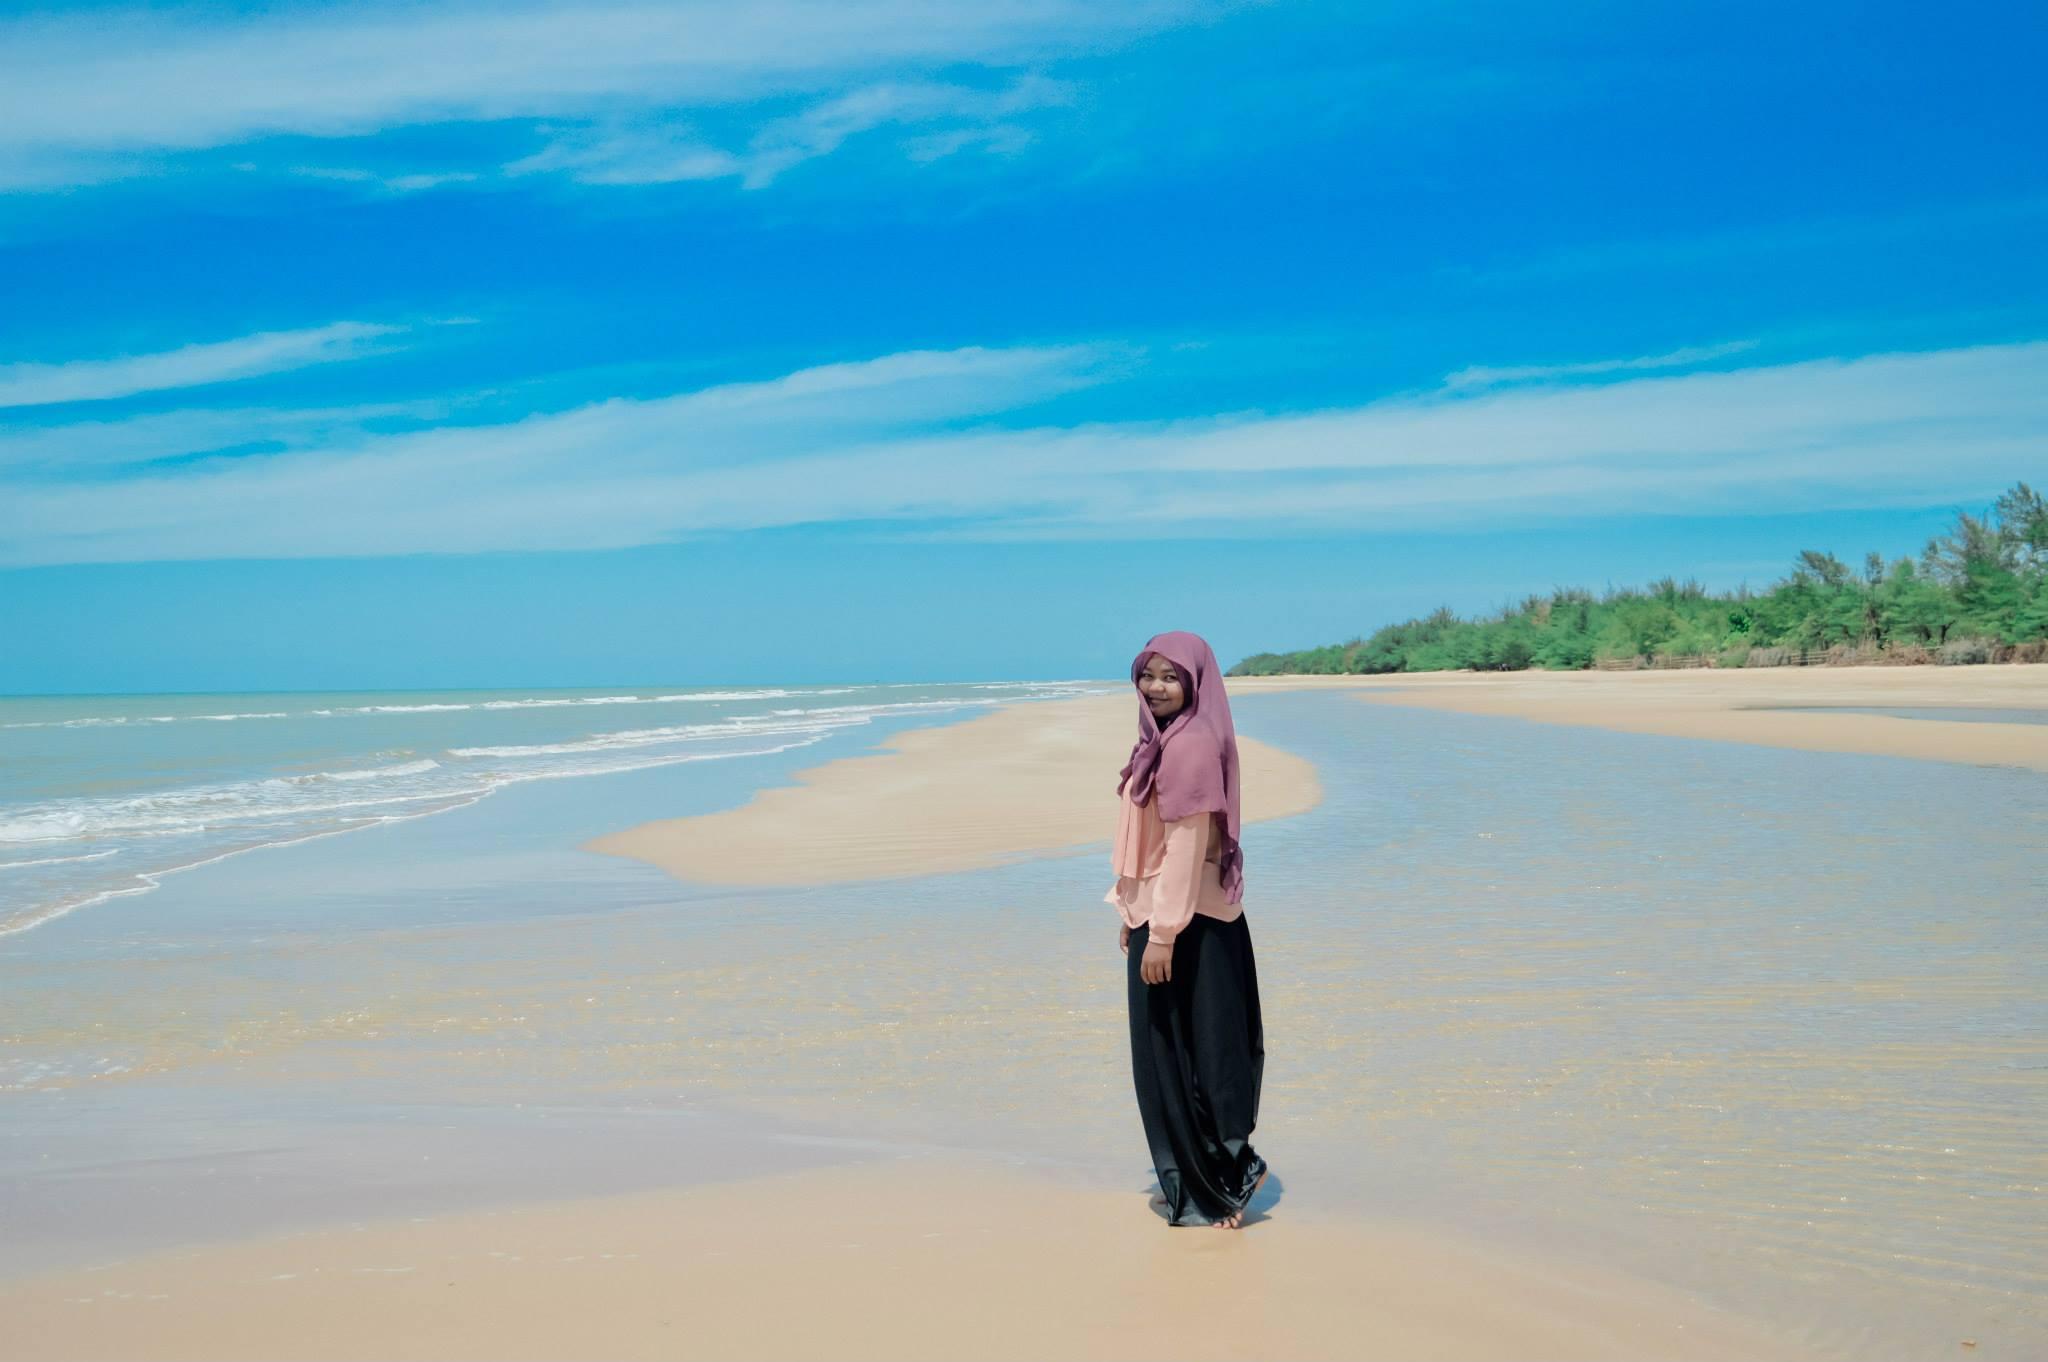 Pantai Lombang Surga Pribadi Di Pulau Garam Wego Indonesia Travel Blog